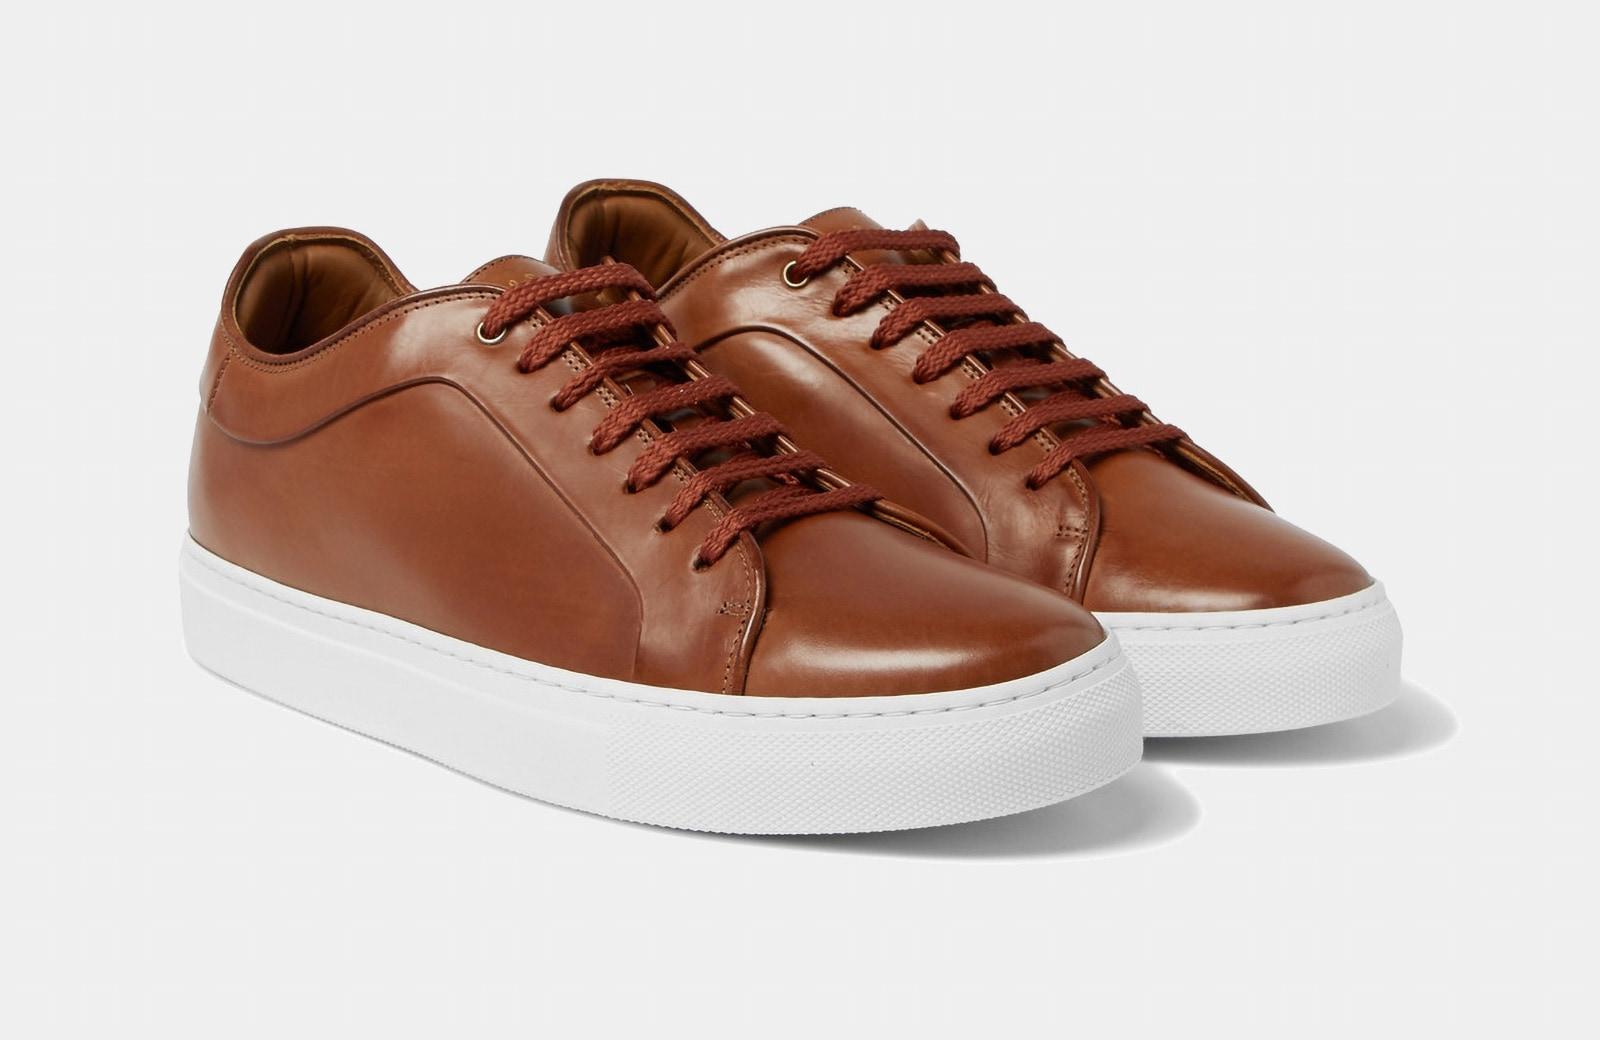 best premium leather sneaker men Paul Smith luxury style - Luxe Digital